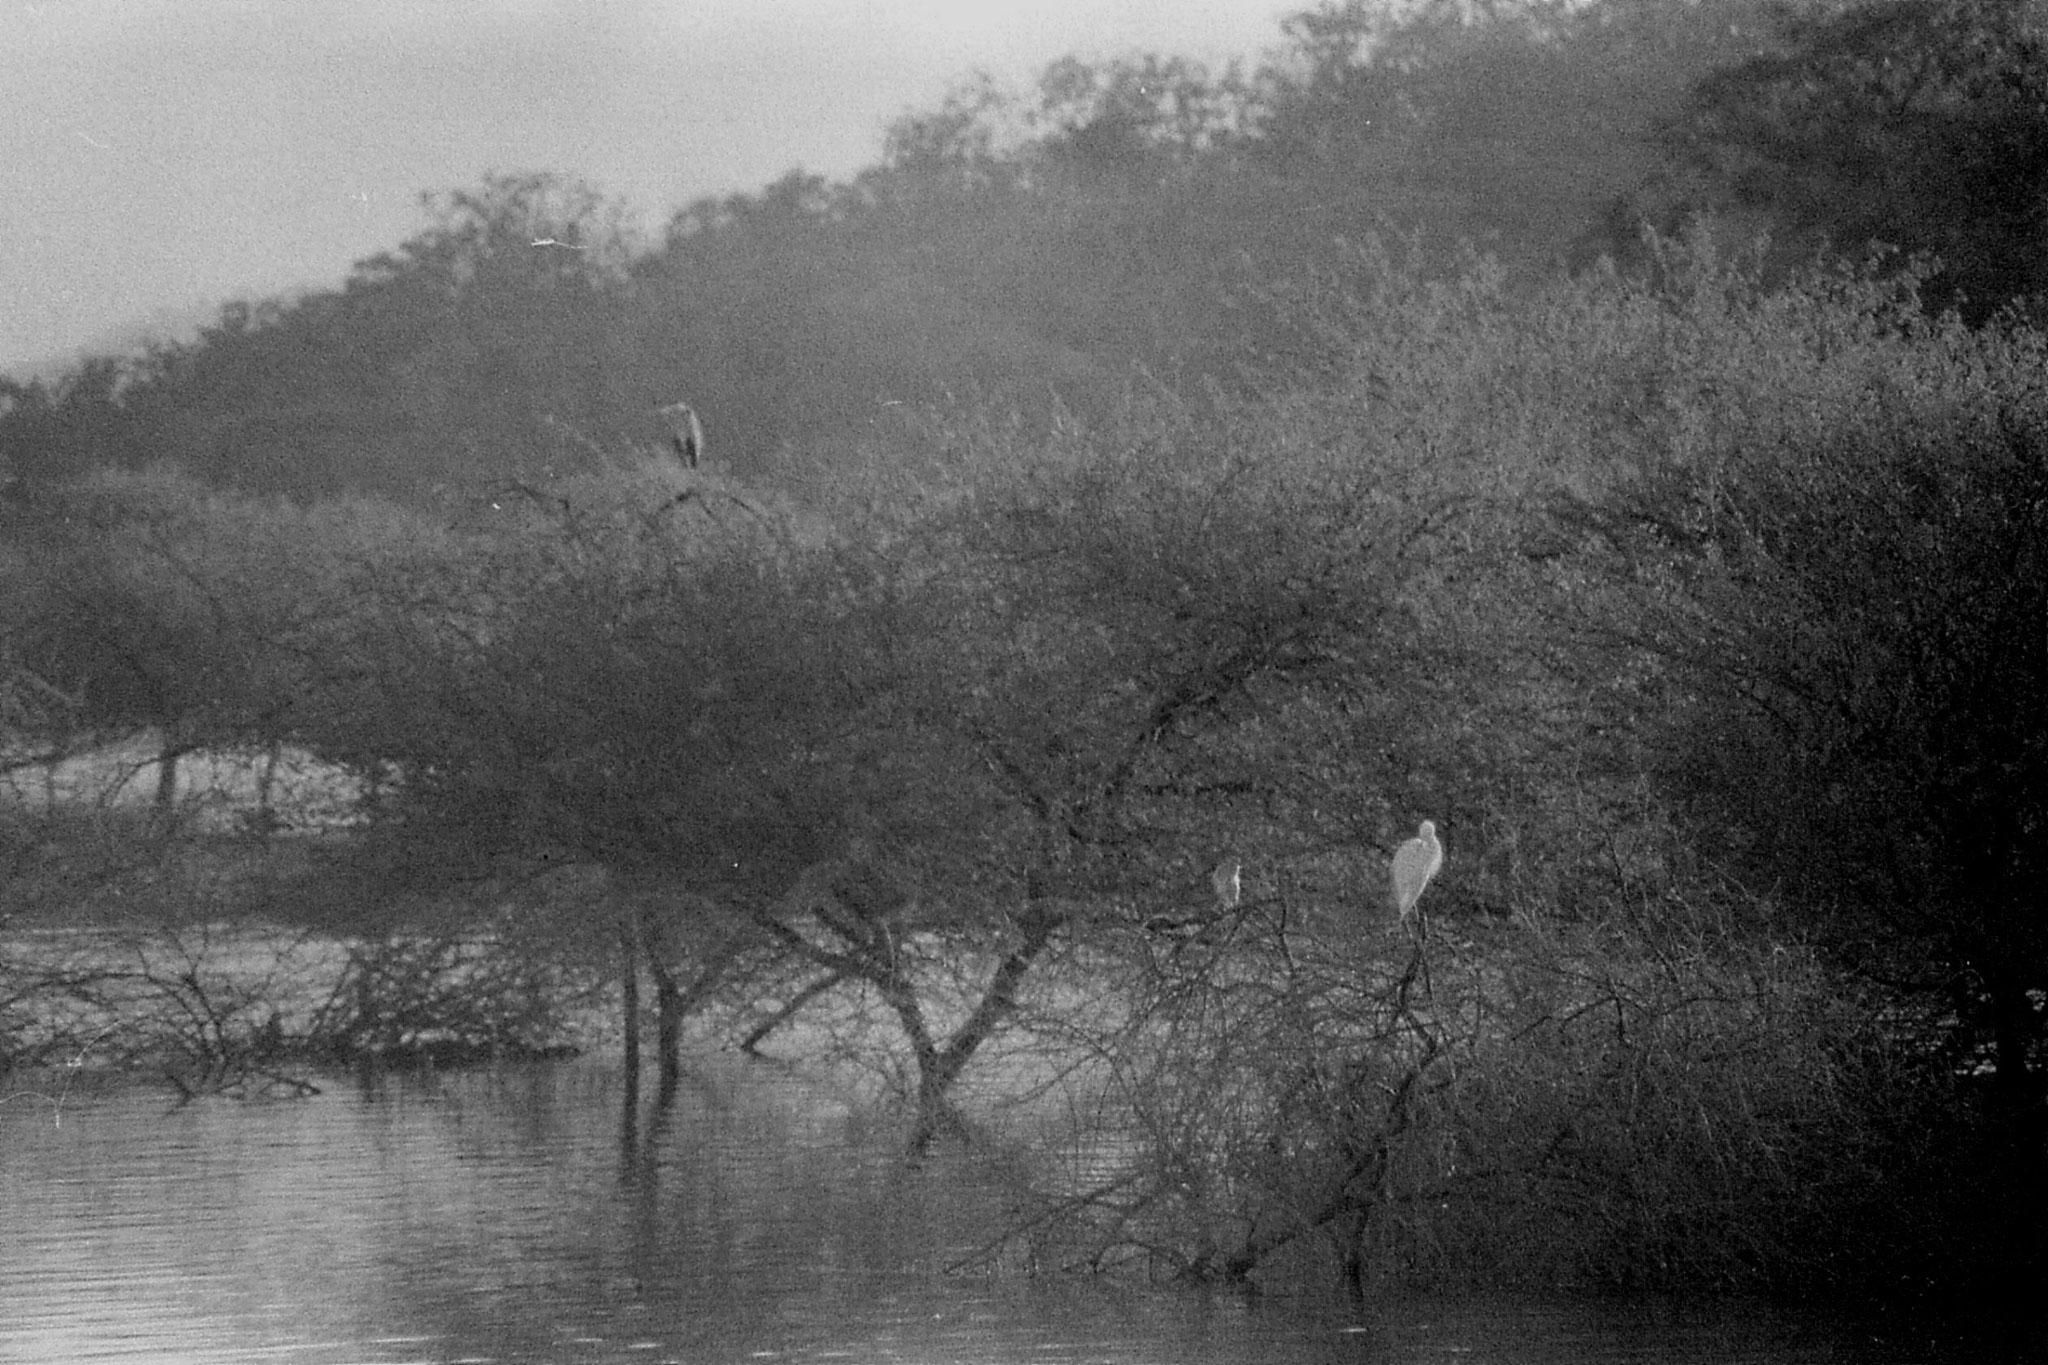 13/12/89: 9: birds on reservoir